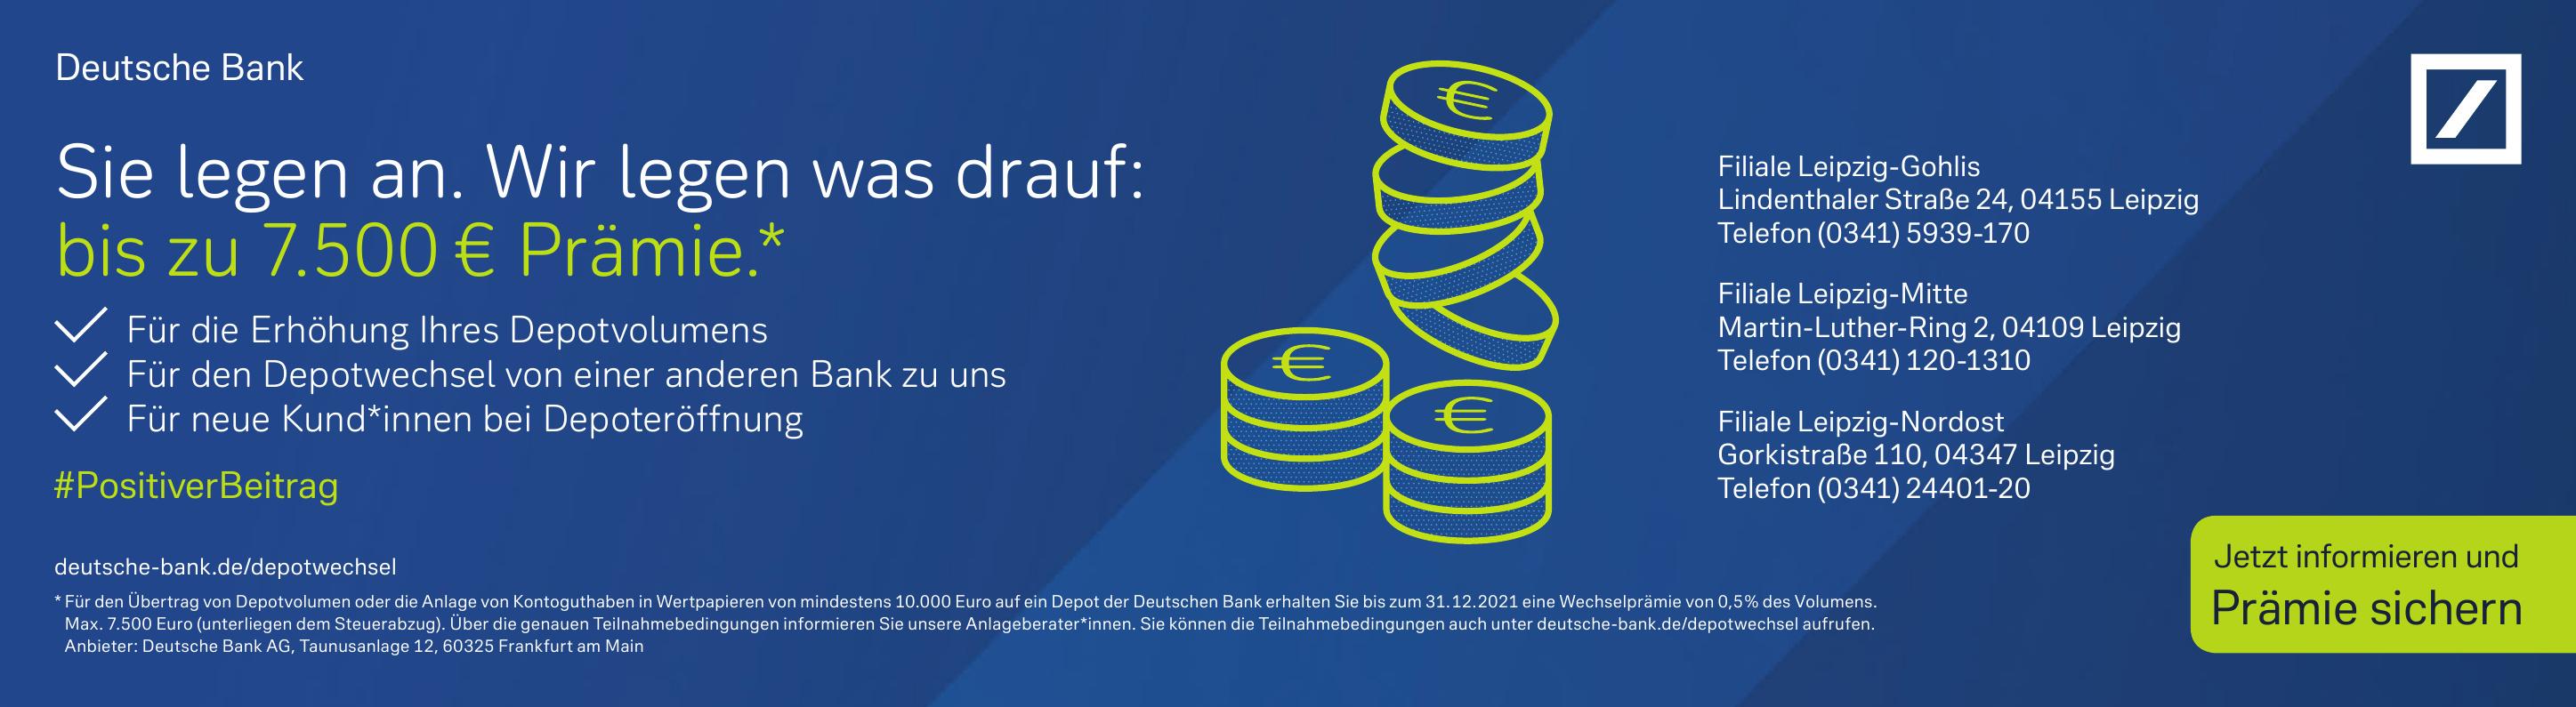 Deutsche Bank - Filiale Leipzig-Gohlis